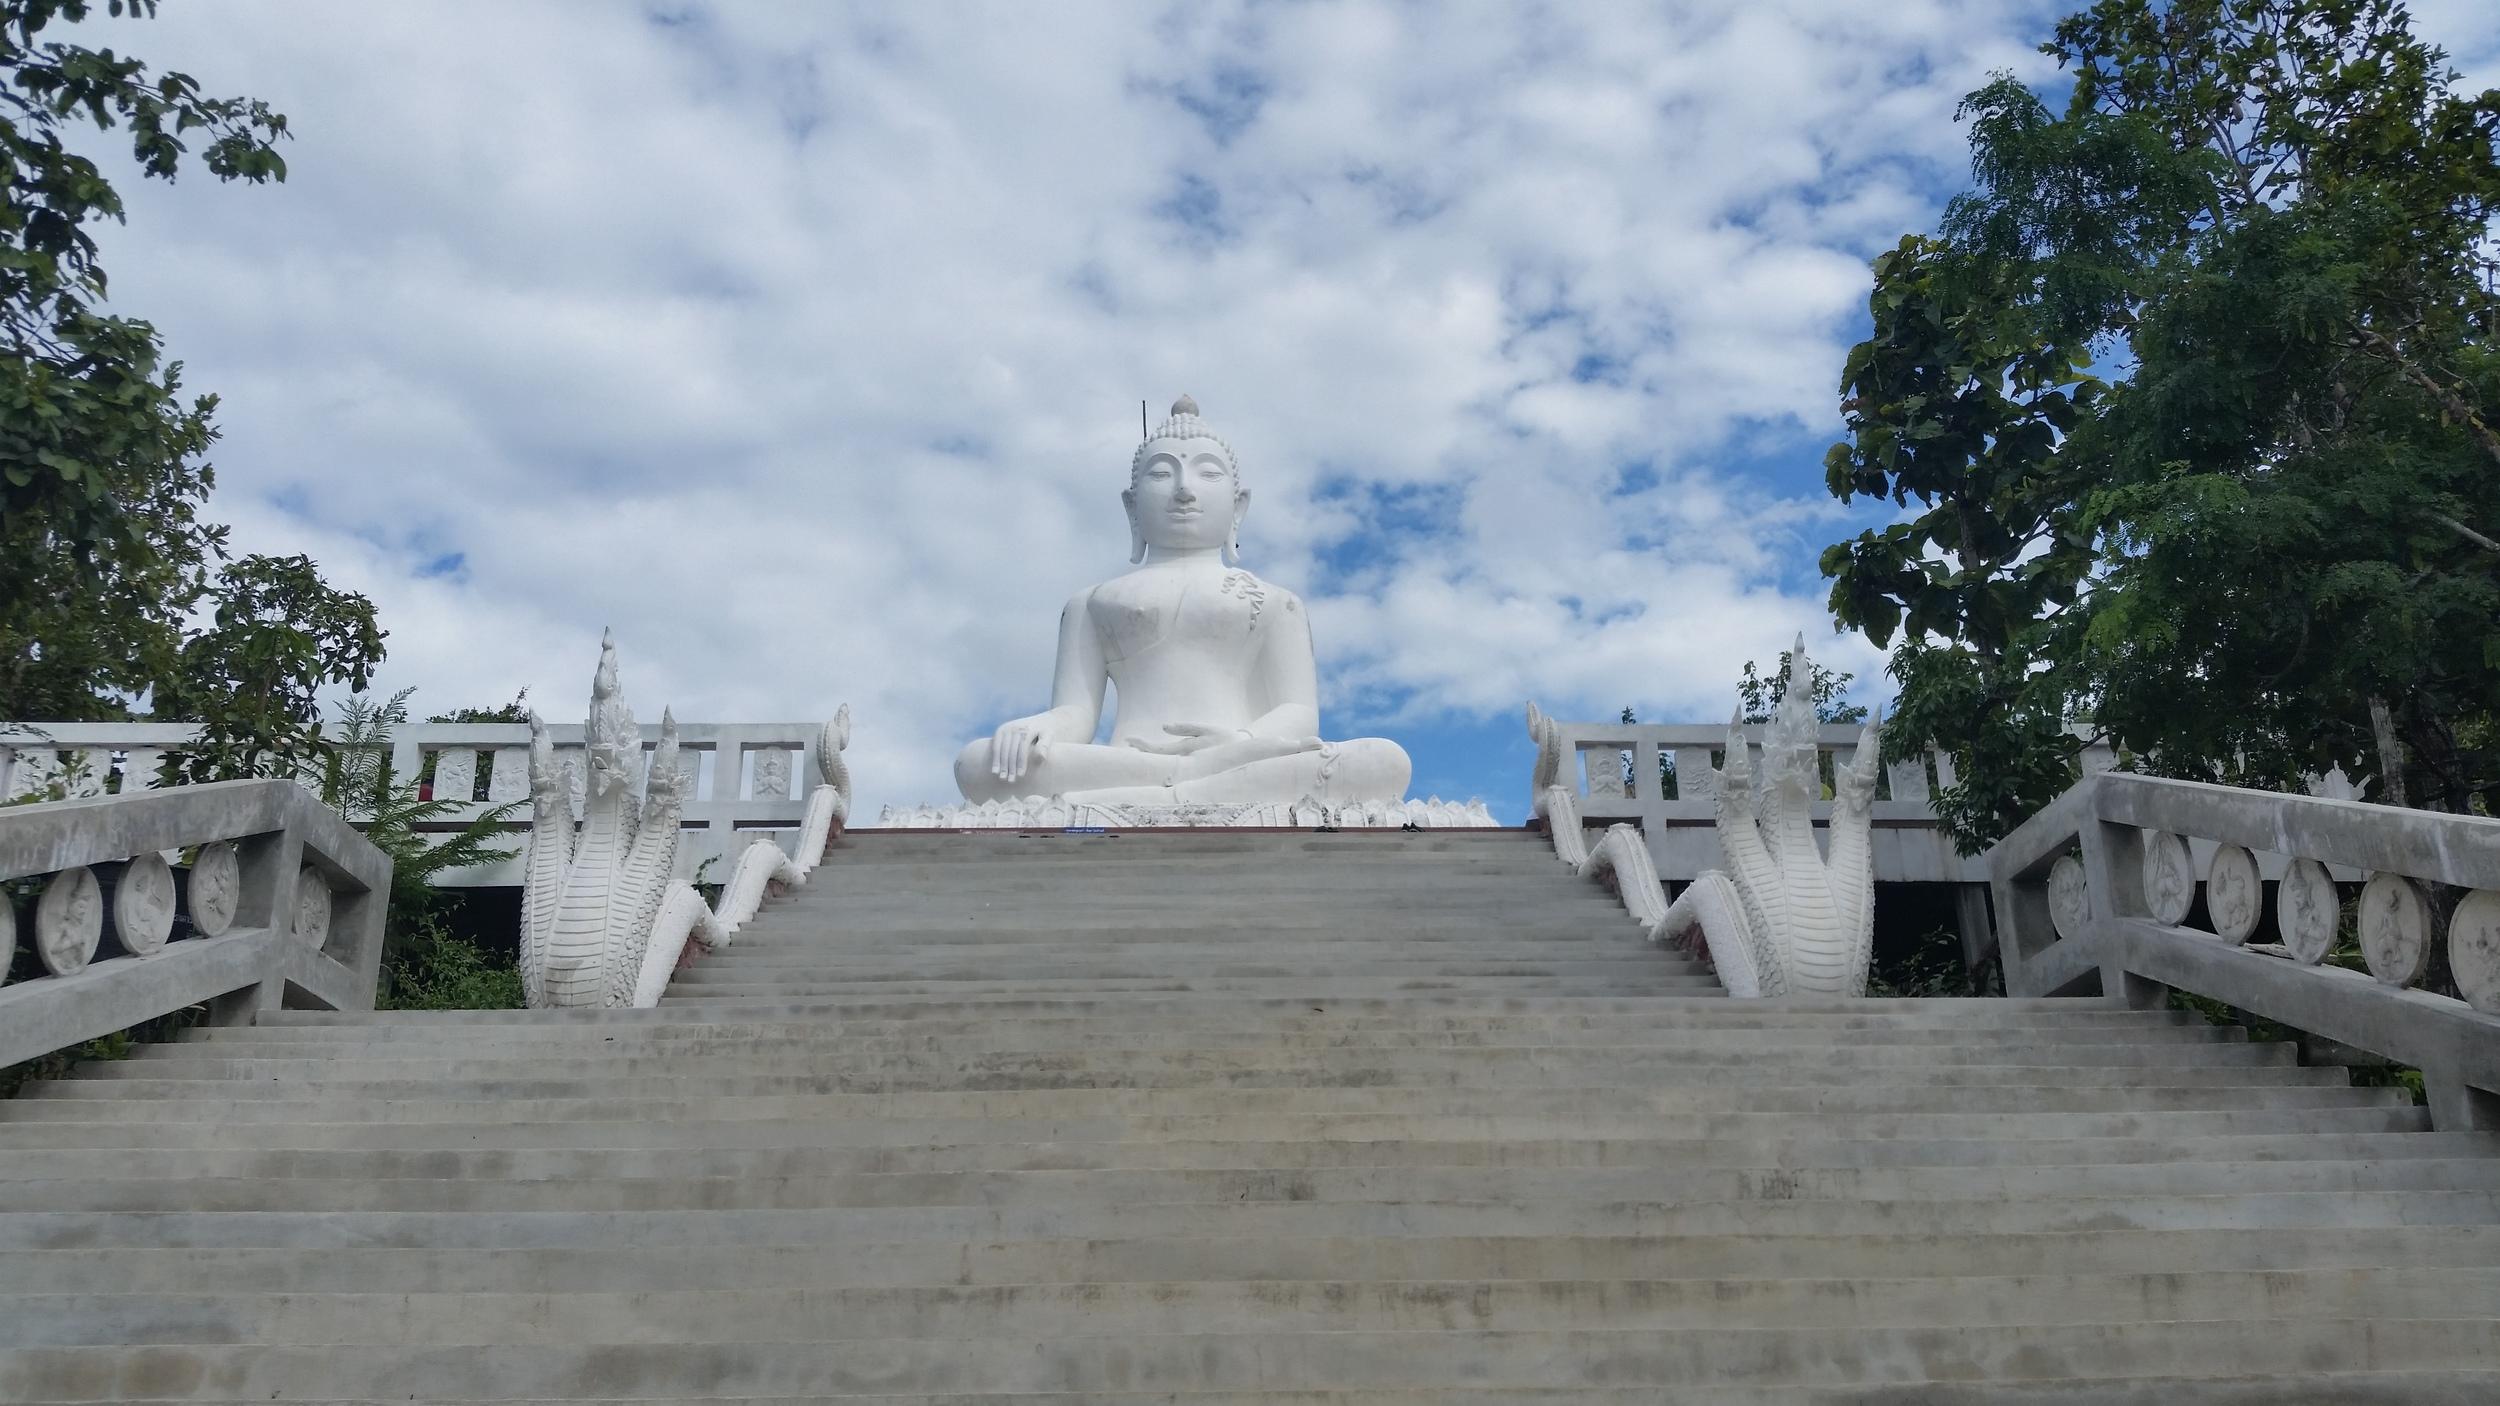 White Buddha on the hill - Pai